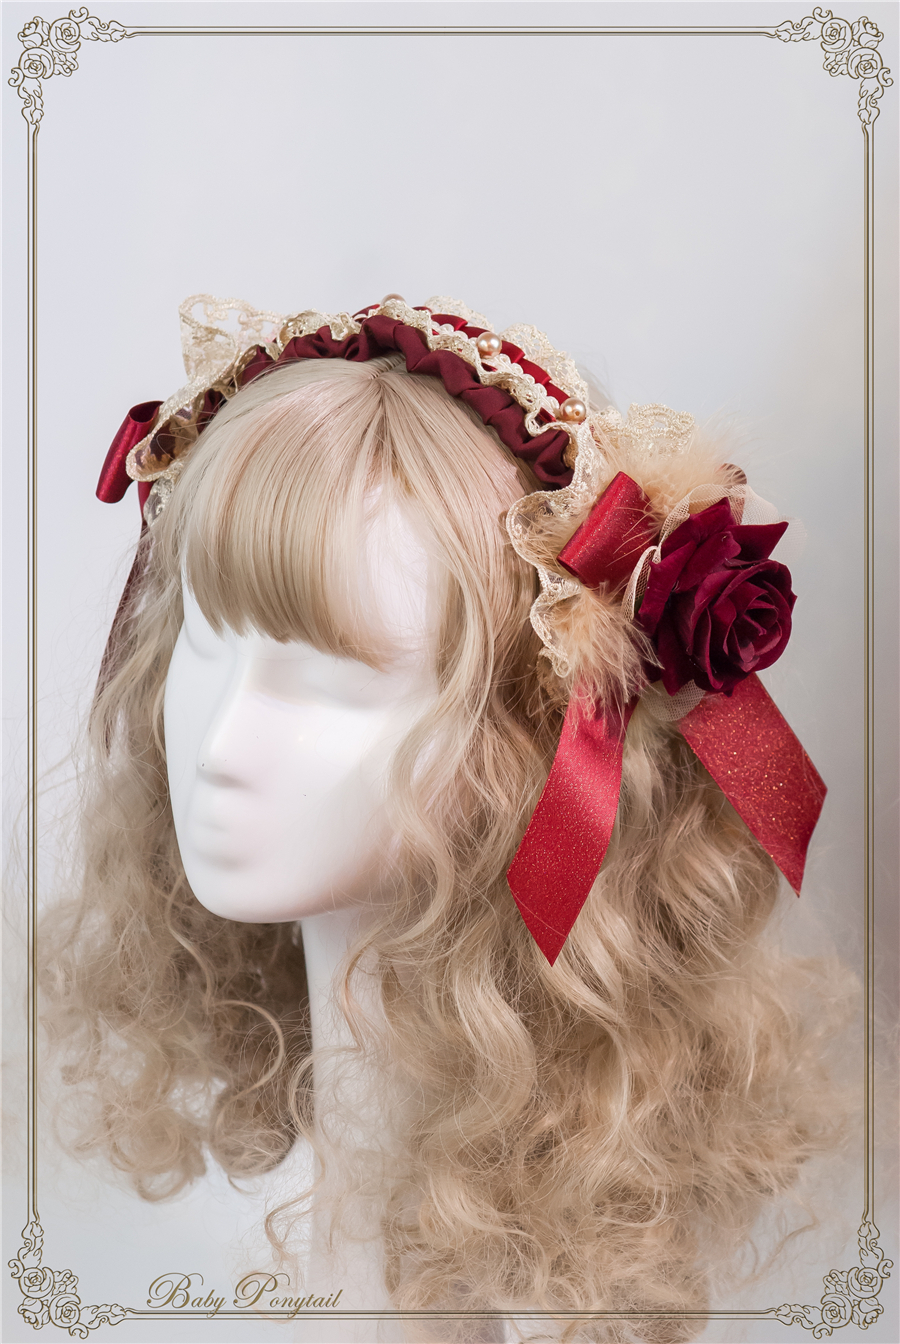 Baby Ponytail_Stock photo_Circus Princess_Rose Head Dress Red_02.jpg